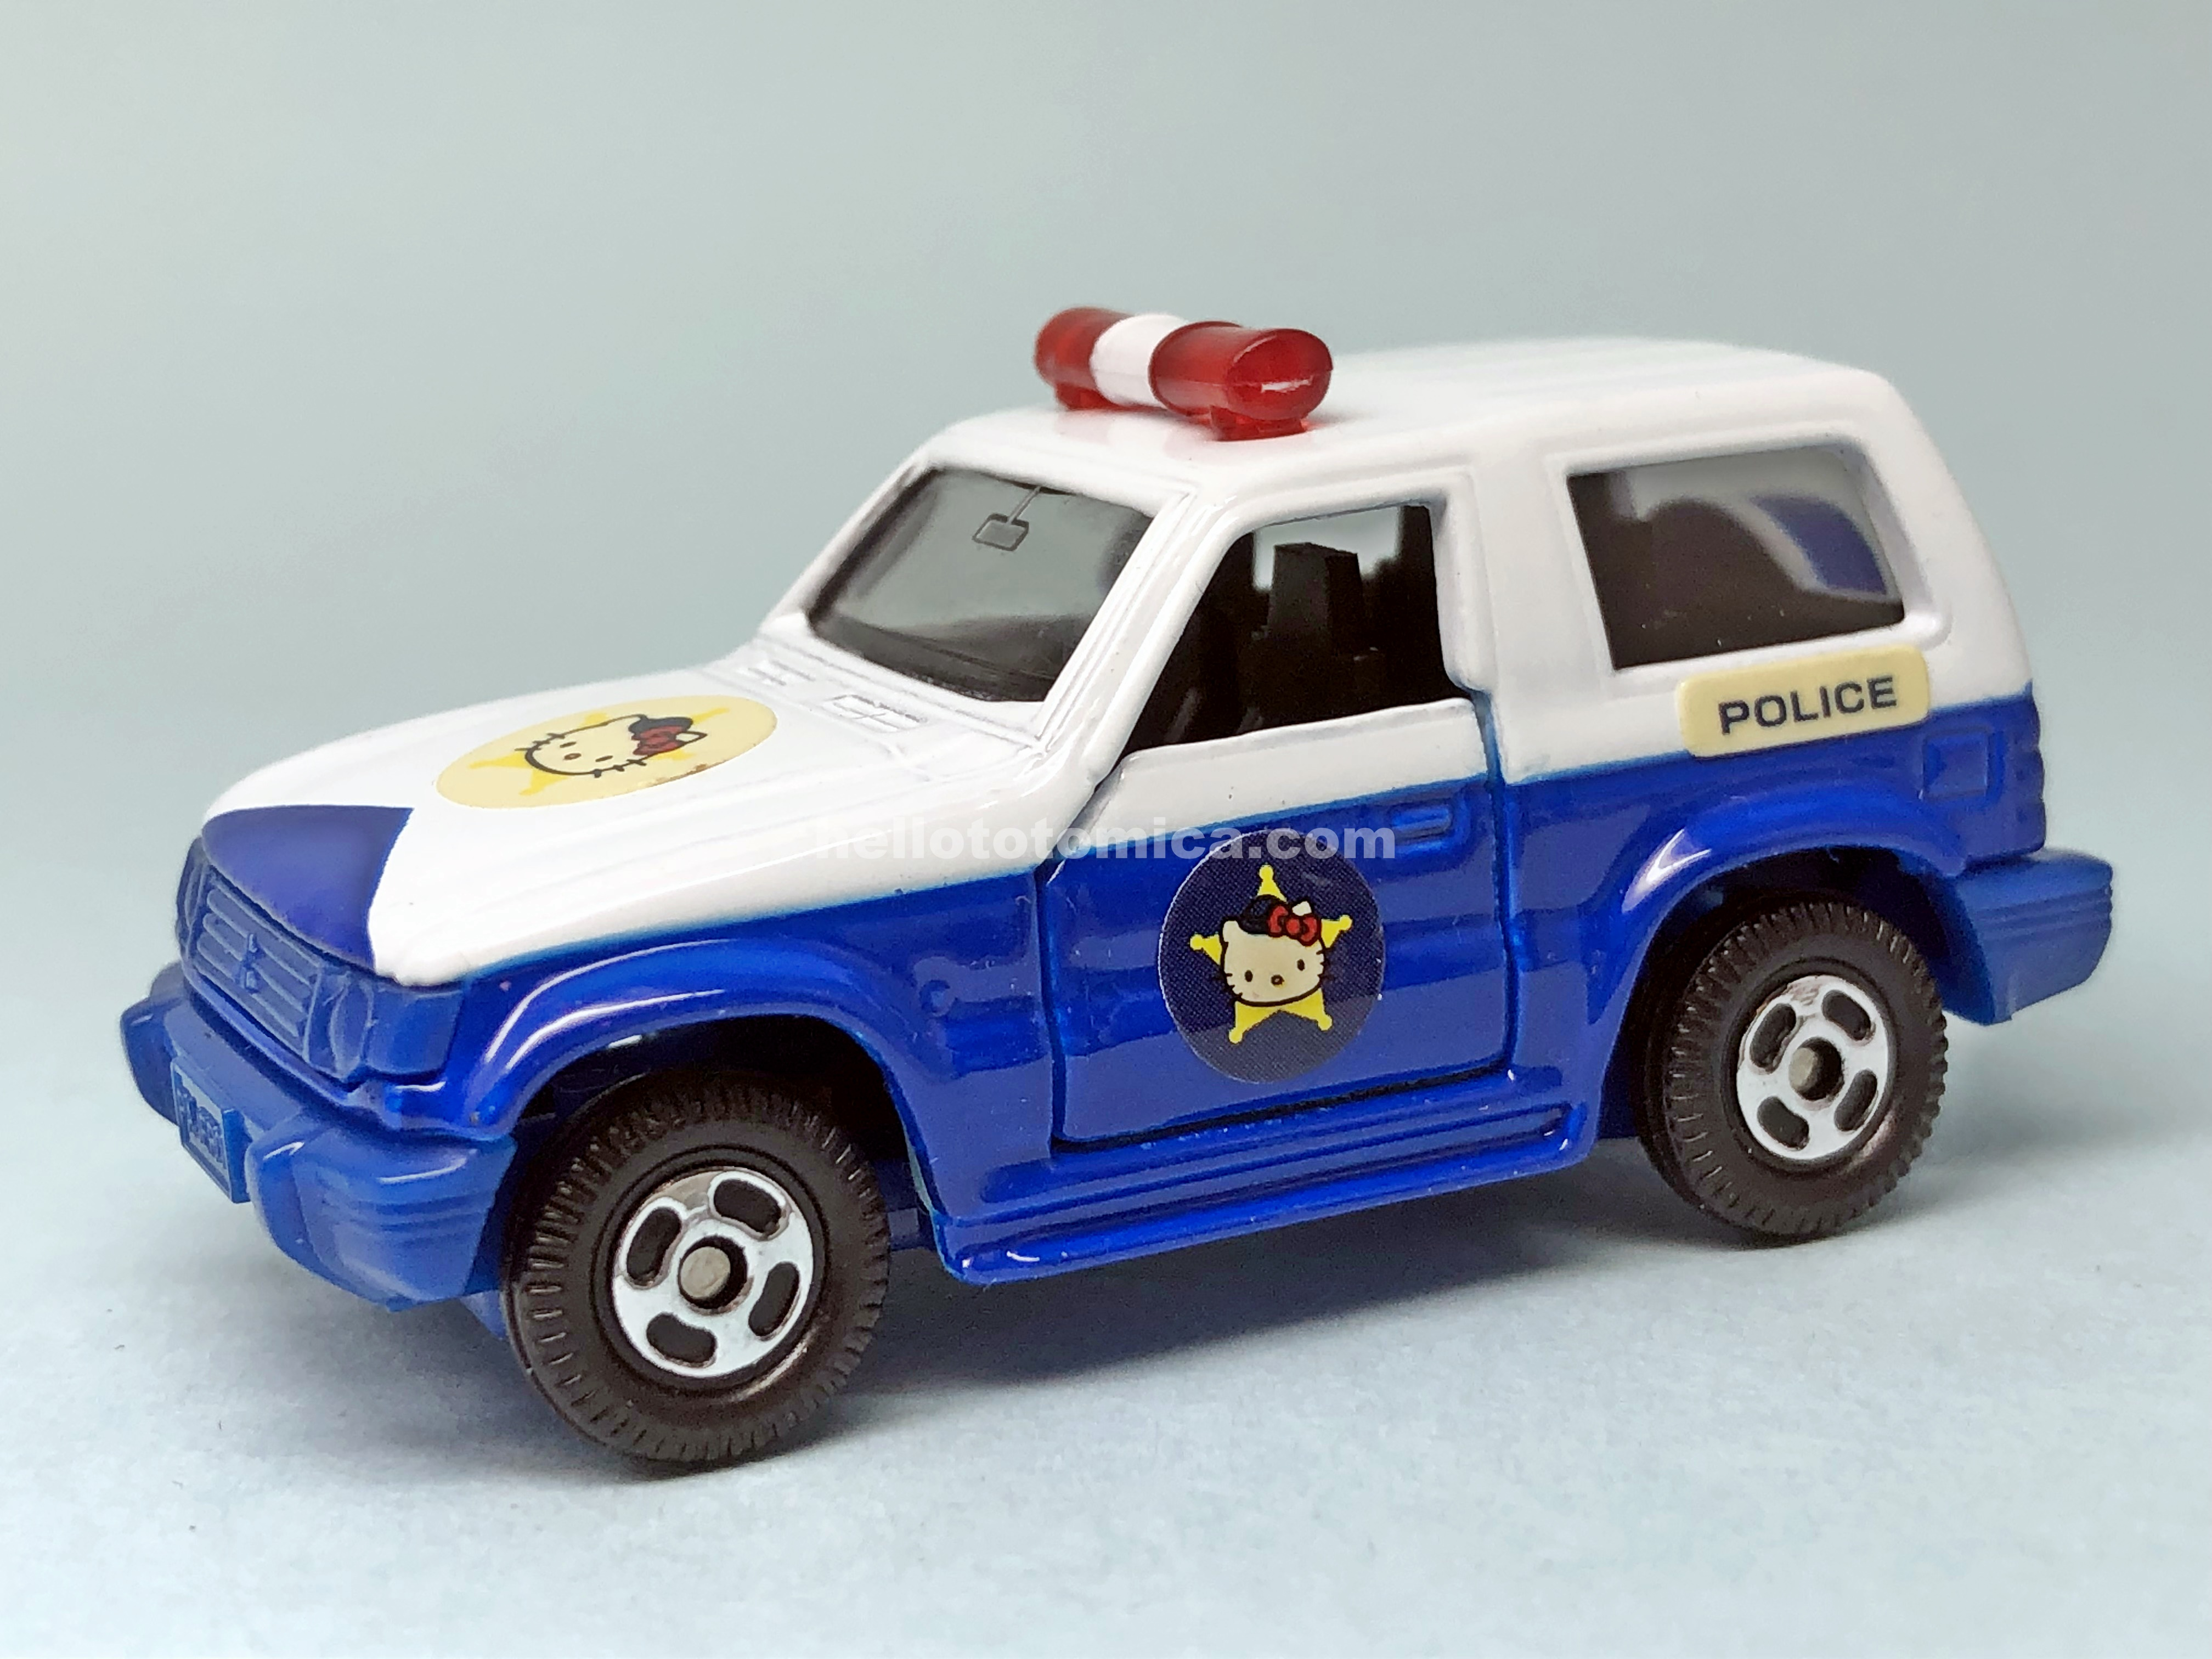 106-3 MITSUBISHI PAJERO PATROL CAR